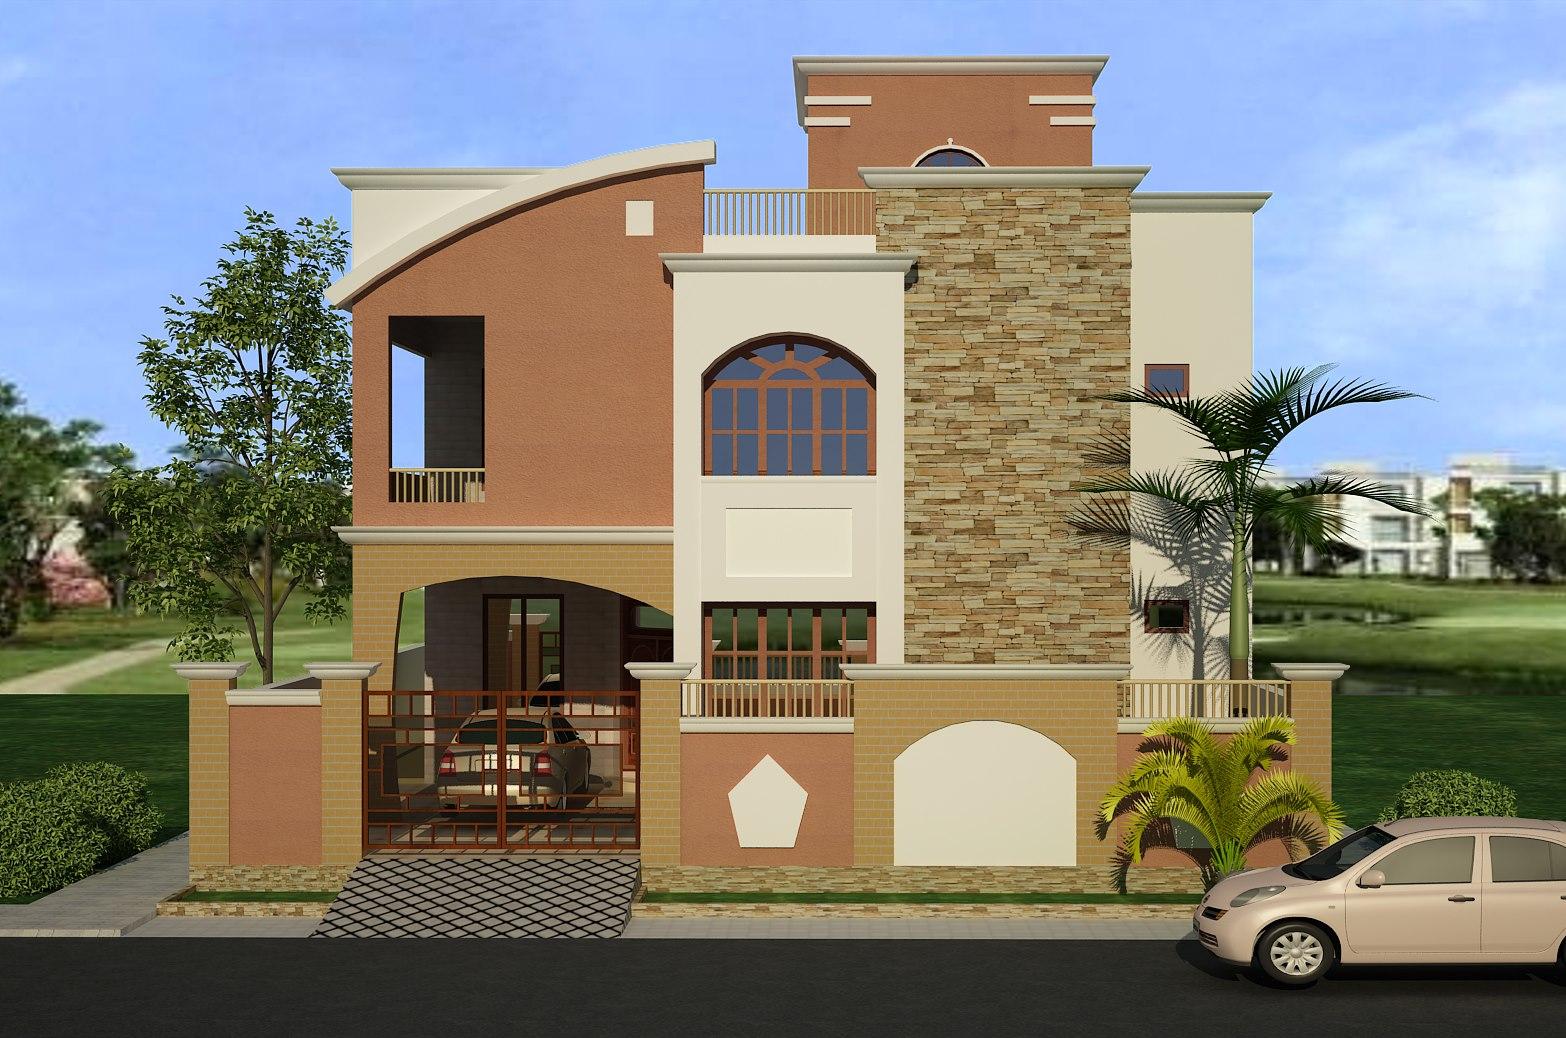 Front House Elevation - Native Home Garden Design